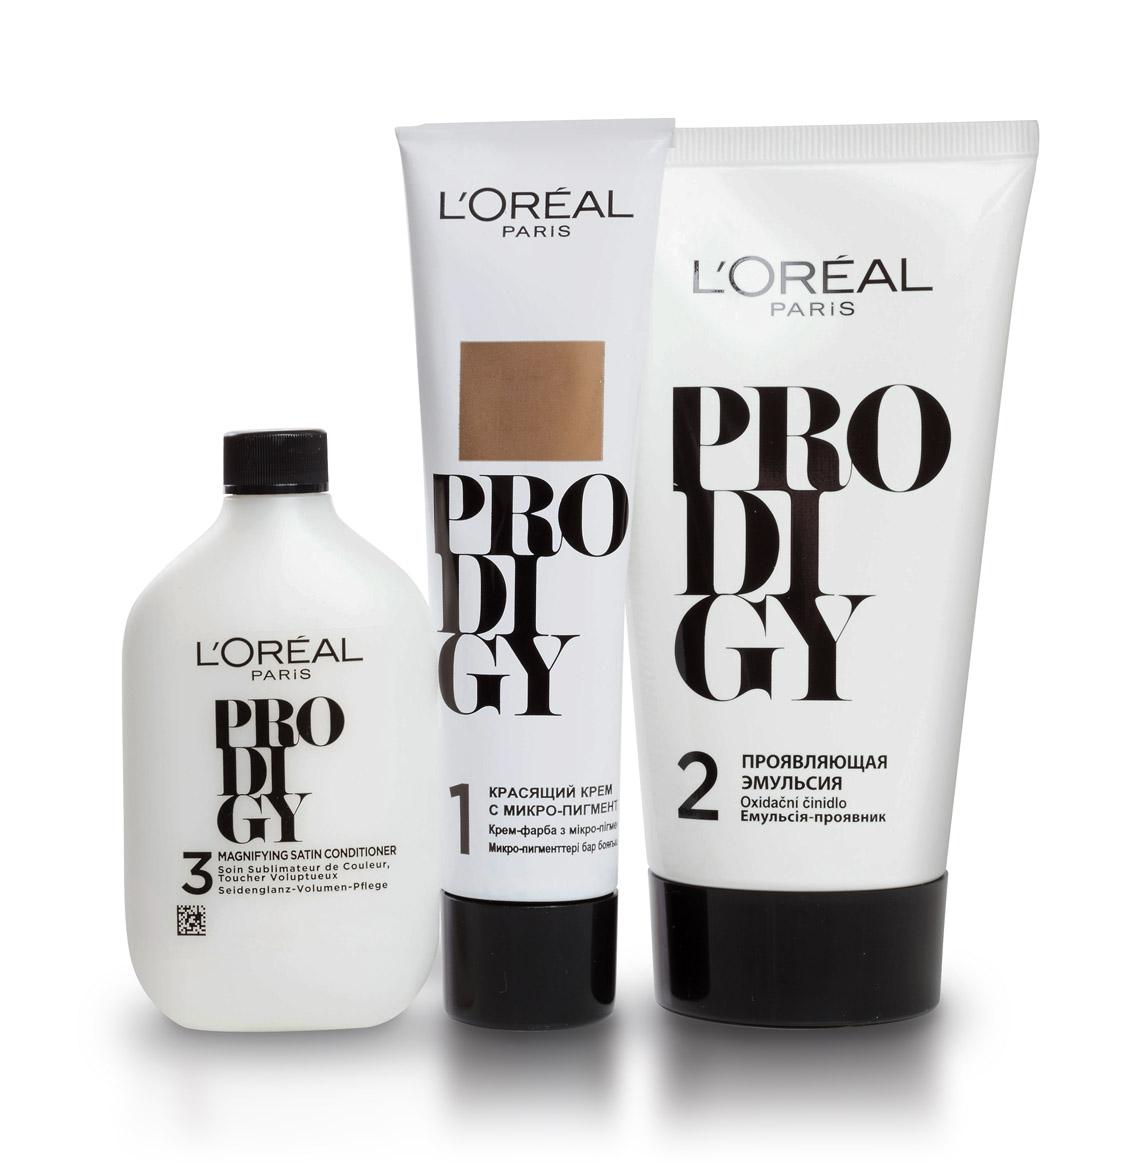 LOreal Paris Краска для волос Prodigy, оттенок 7.1, Серебро, 265 мл